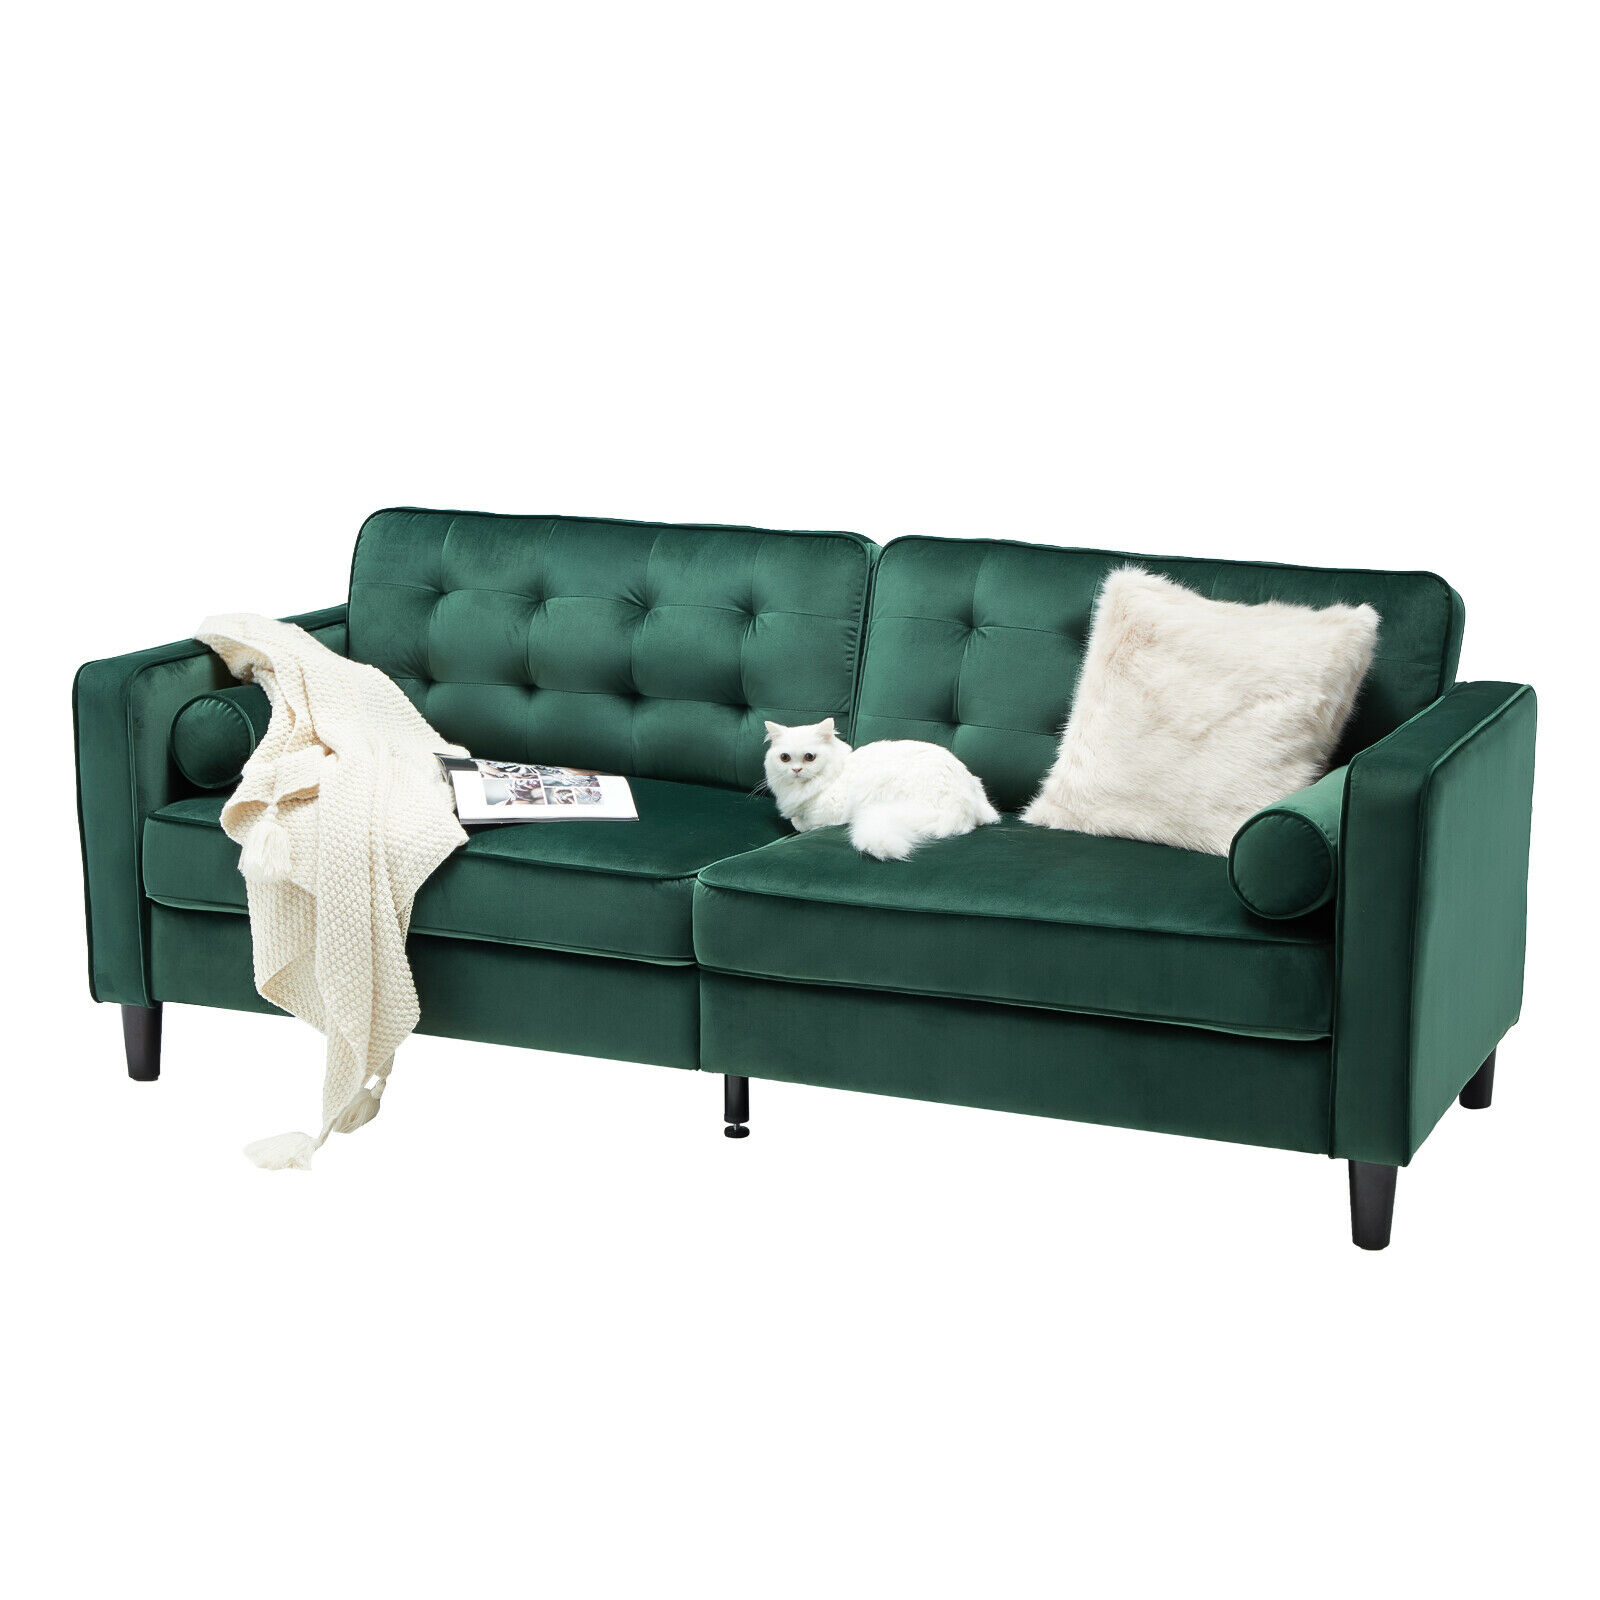 Esright 84.2″ Tufted Velvet Couch Mid Century Modern Sofa Gray & Green Furniture